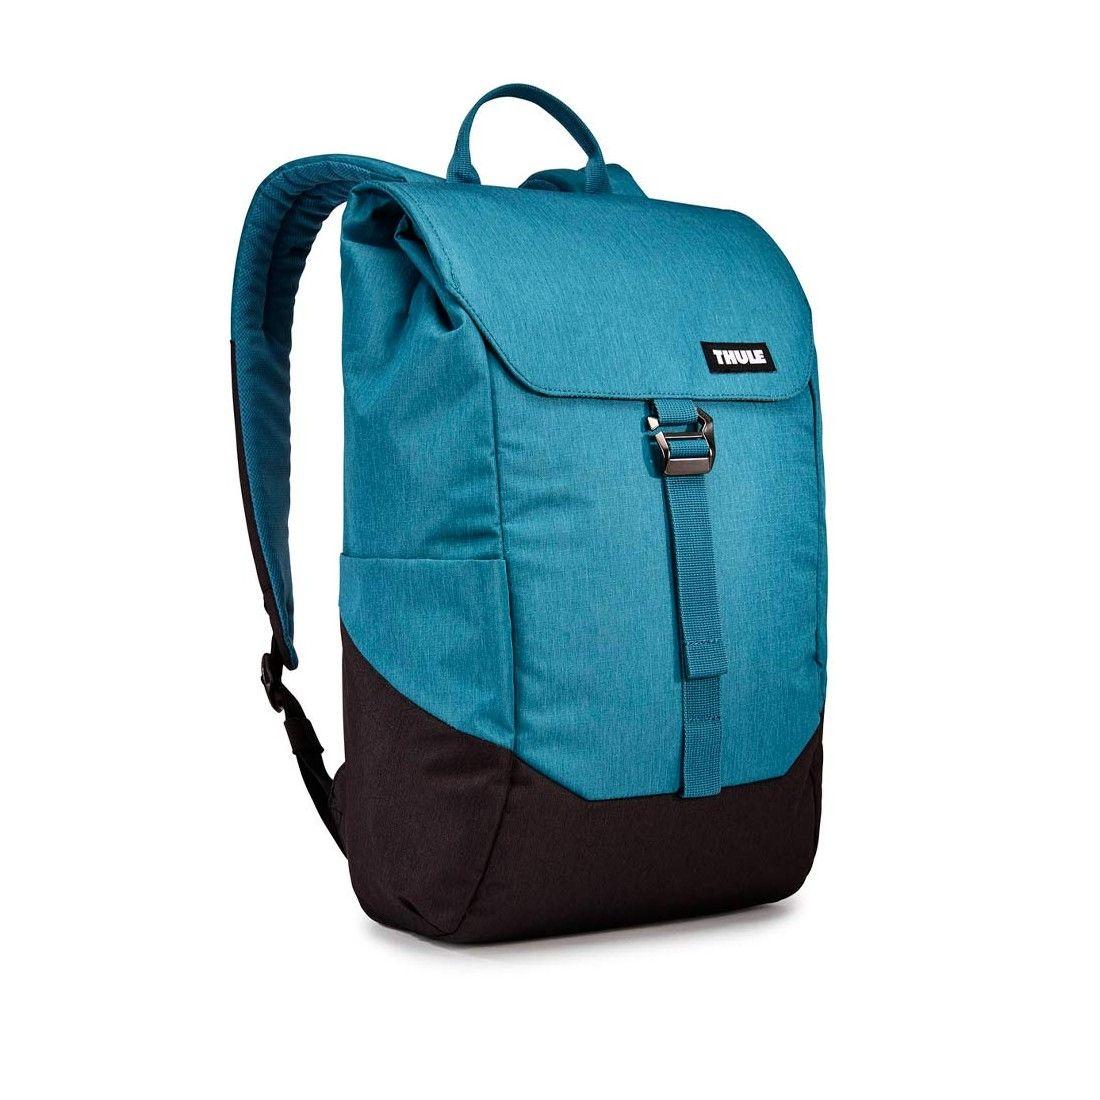 Mochila Lithos Backpack 16 L - Thule - 1